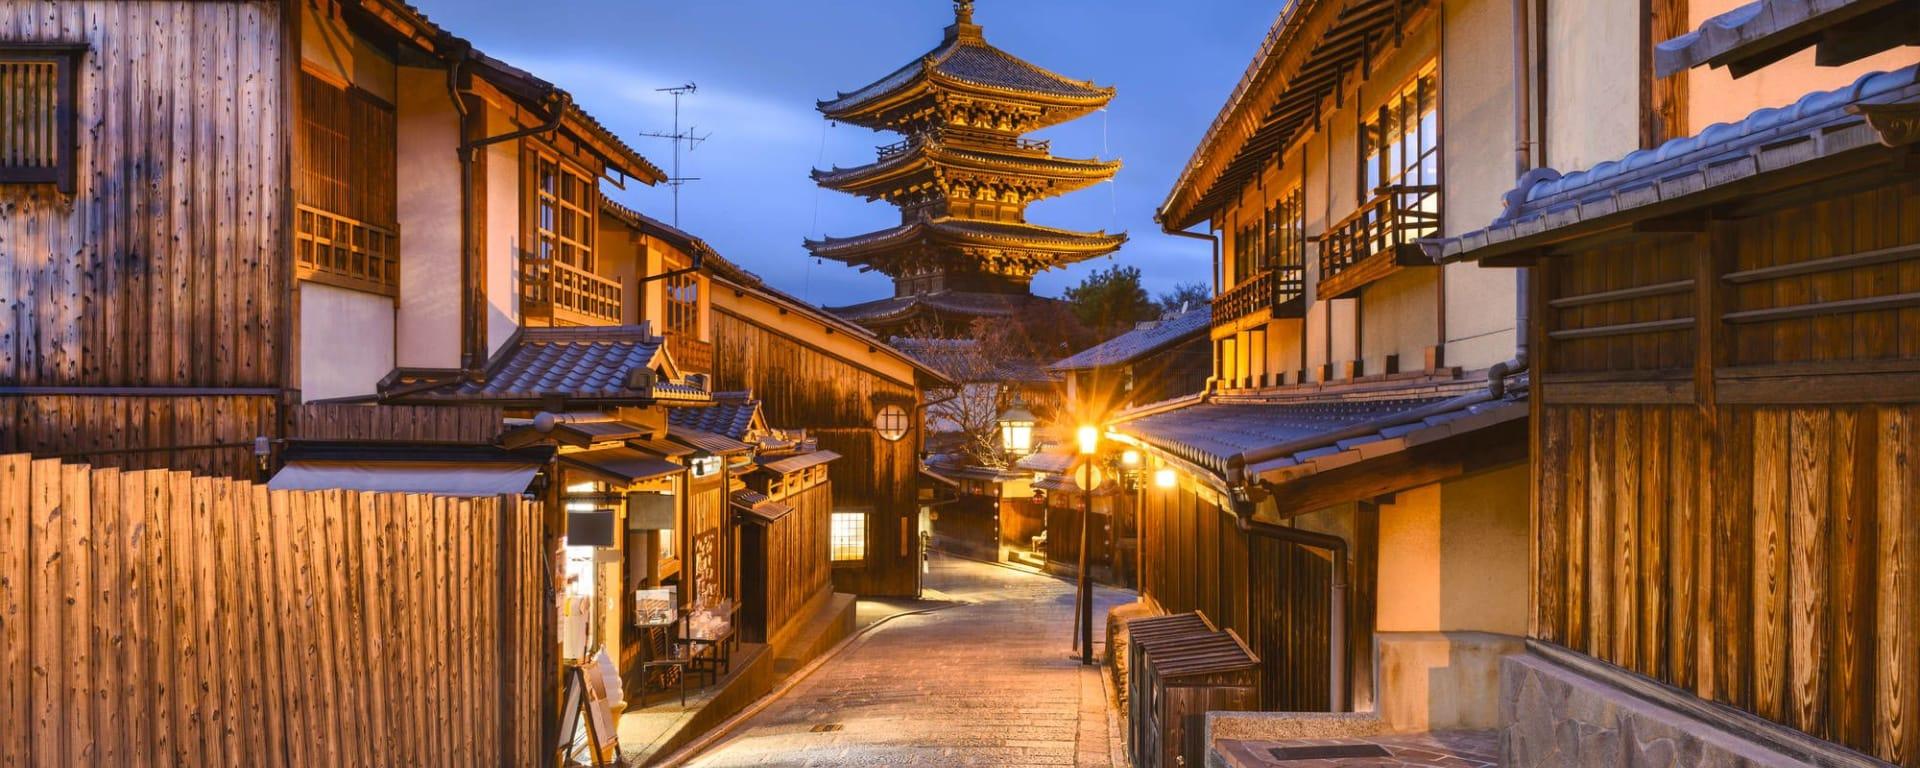 Japan auf neuen Wegen ab Osaka: Kyoto old city at Yasaka Pagoda